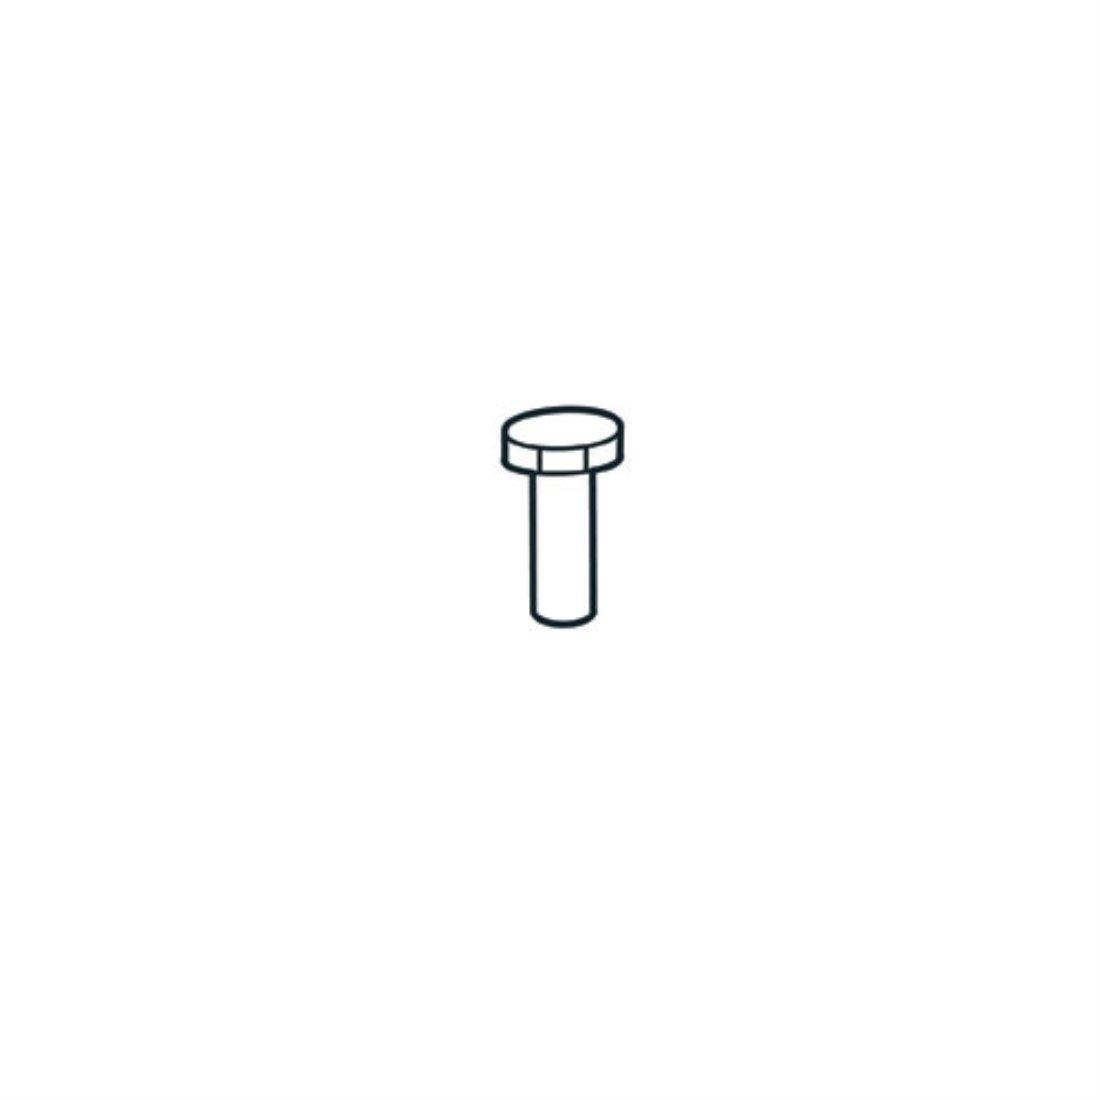 Trend - Set screw hex bolt M8 x 16mm - WP-BOLT/11: Amazon co